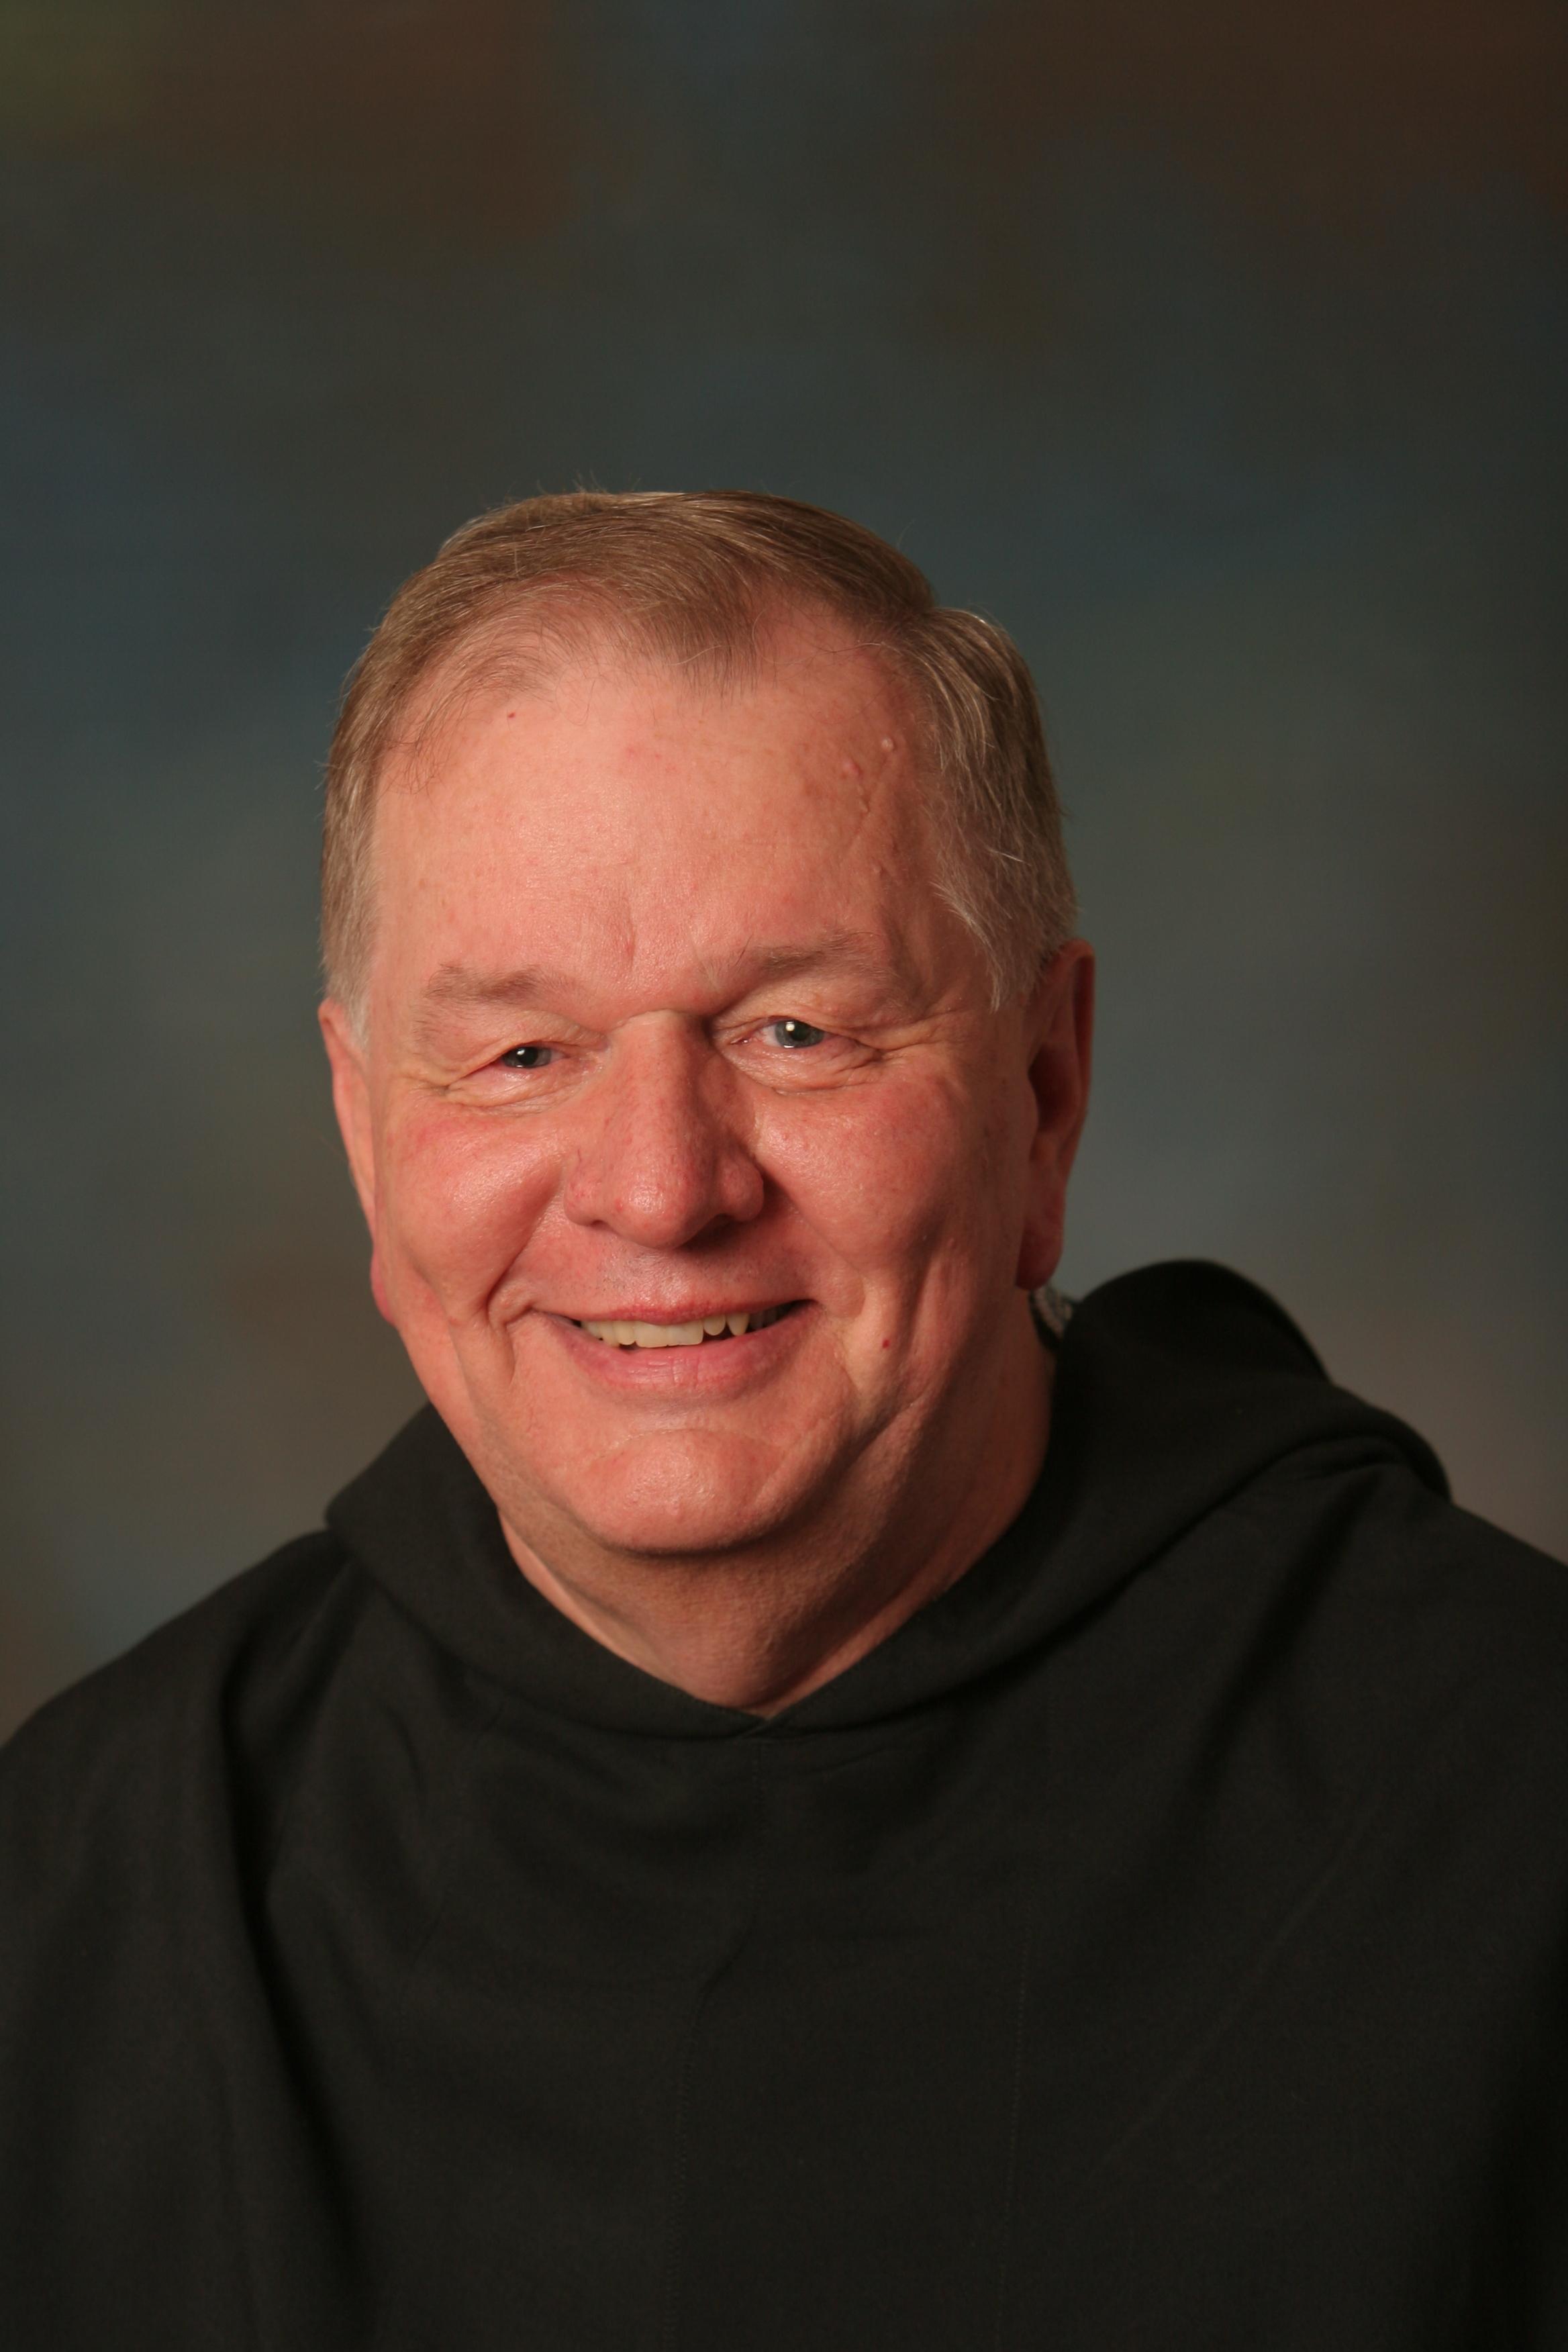 Br. Jerome Sysko, O.S.A. - Former Prior of Health Care Community